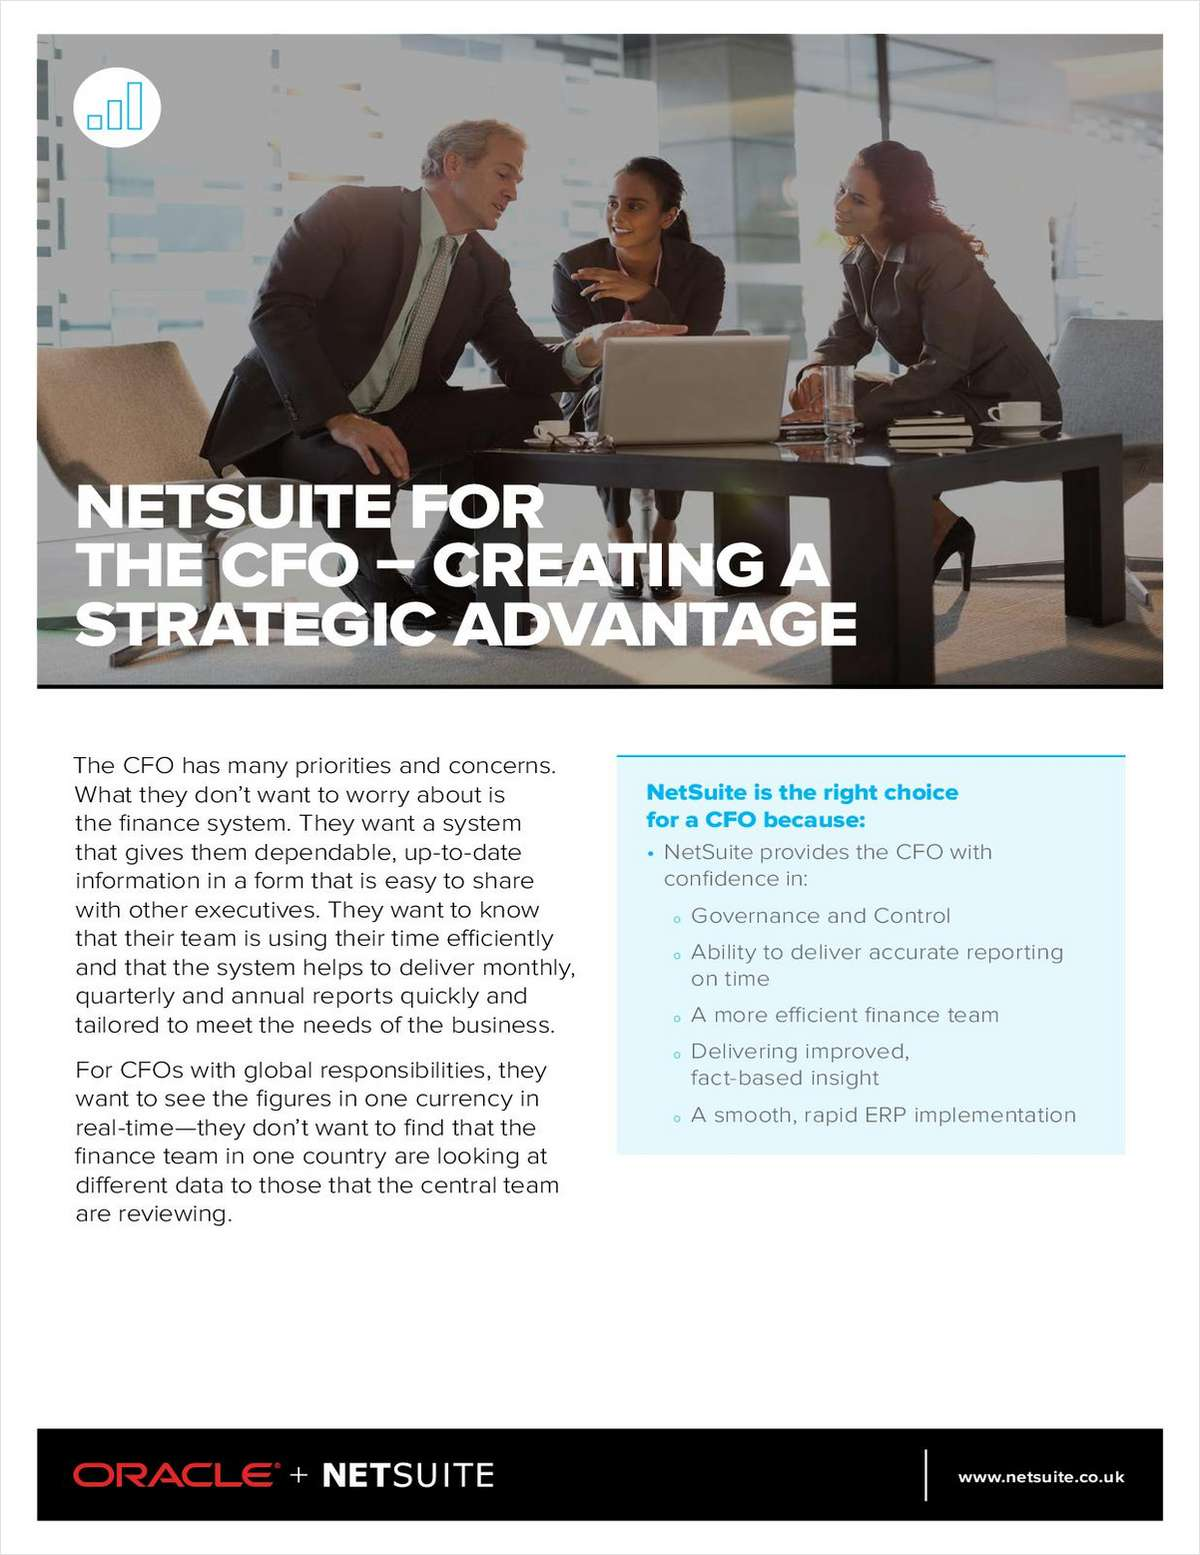 NetSuite Gives the CFO a Strategic Advantage